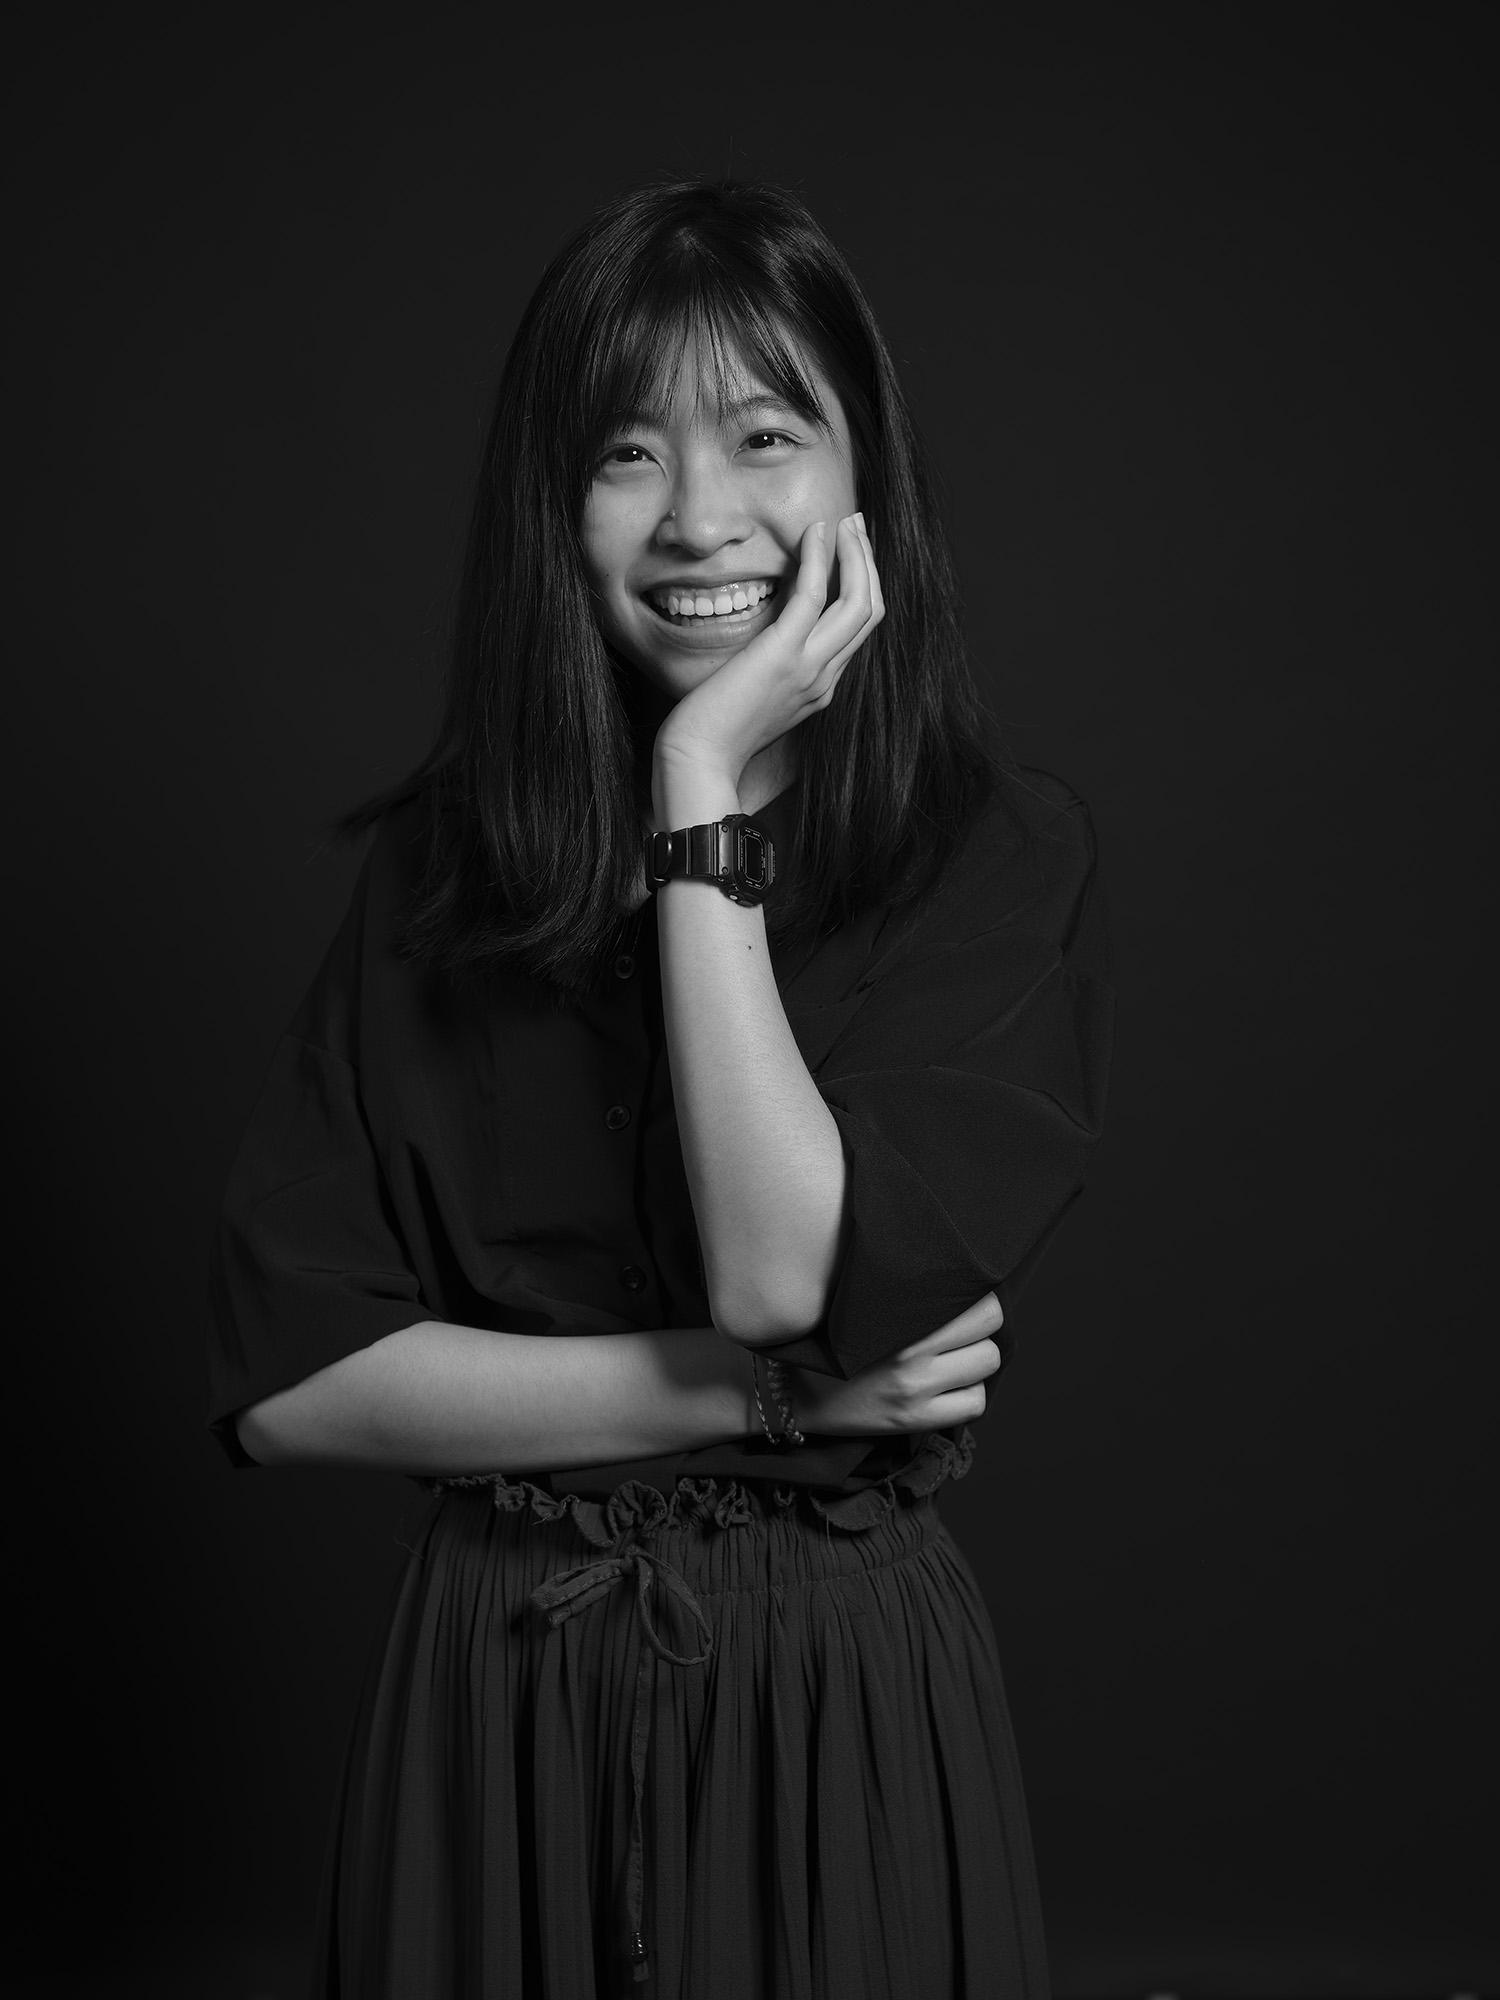 Ramboll Black and White Photography Portrait Photographer Singapore COCO Creative Studio 4